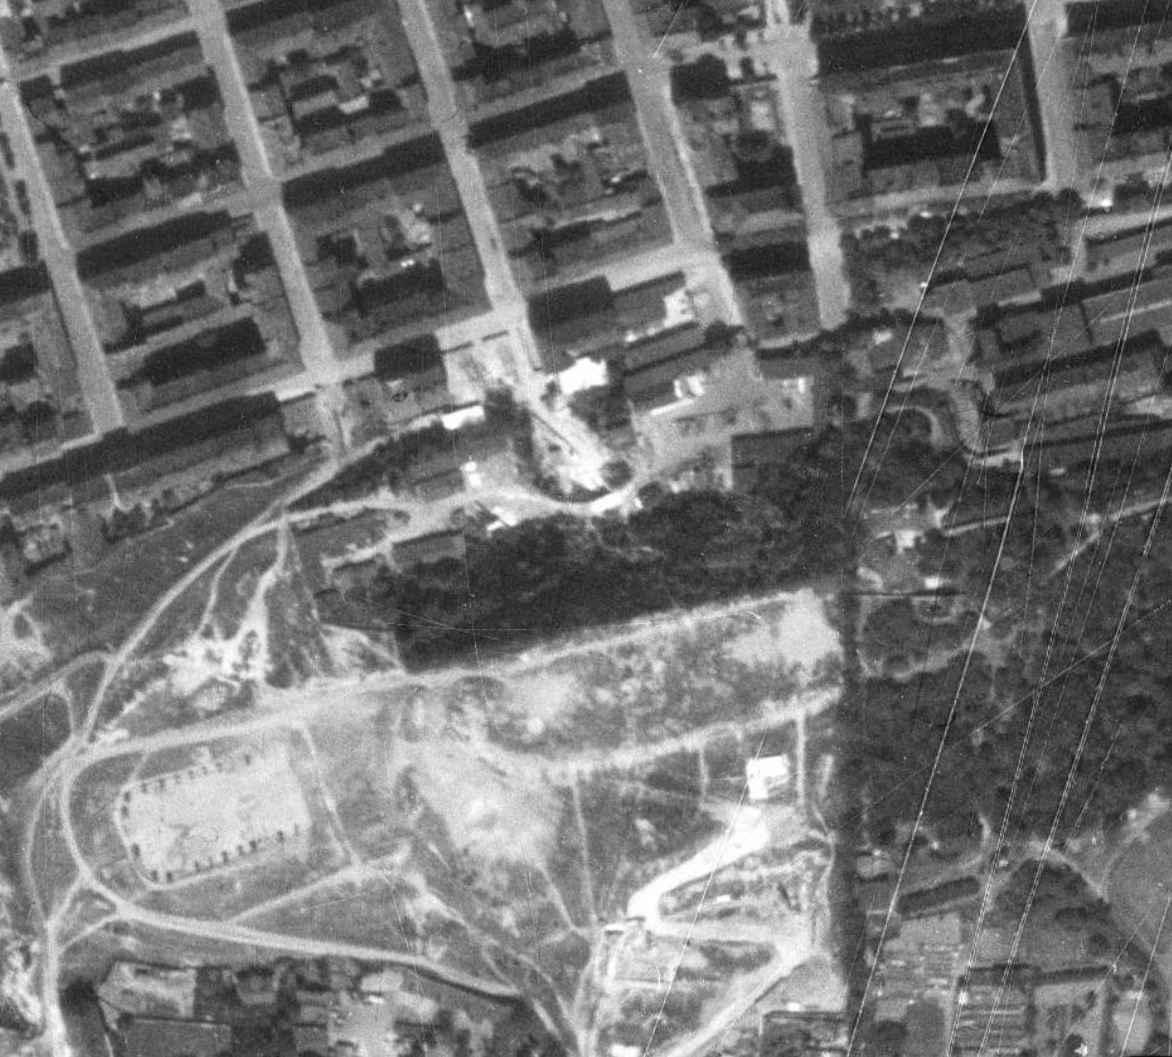 nouzova-kolonie-u-kapslovny-letecky-snimek-1953